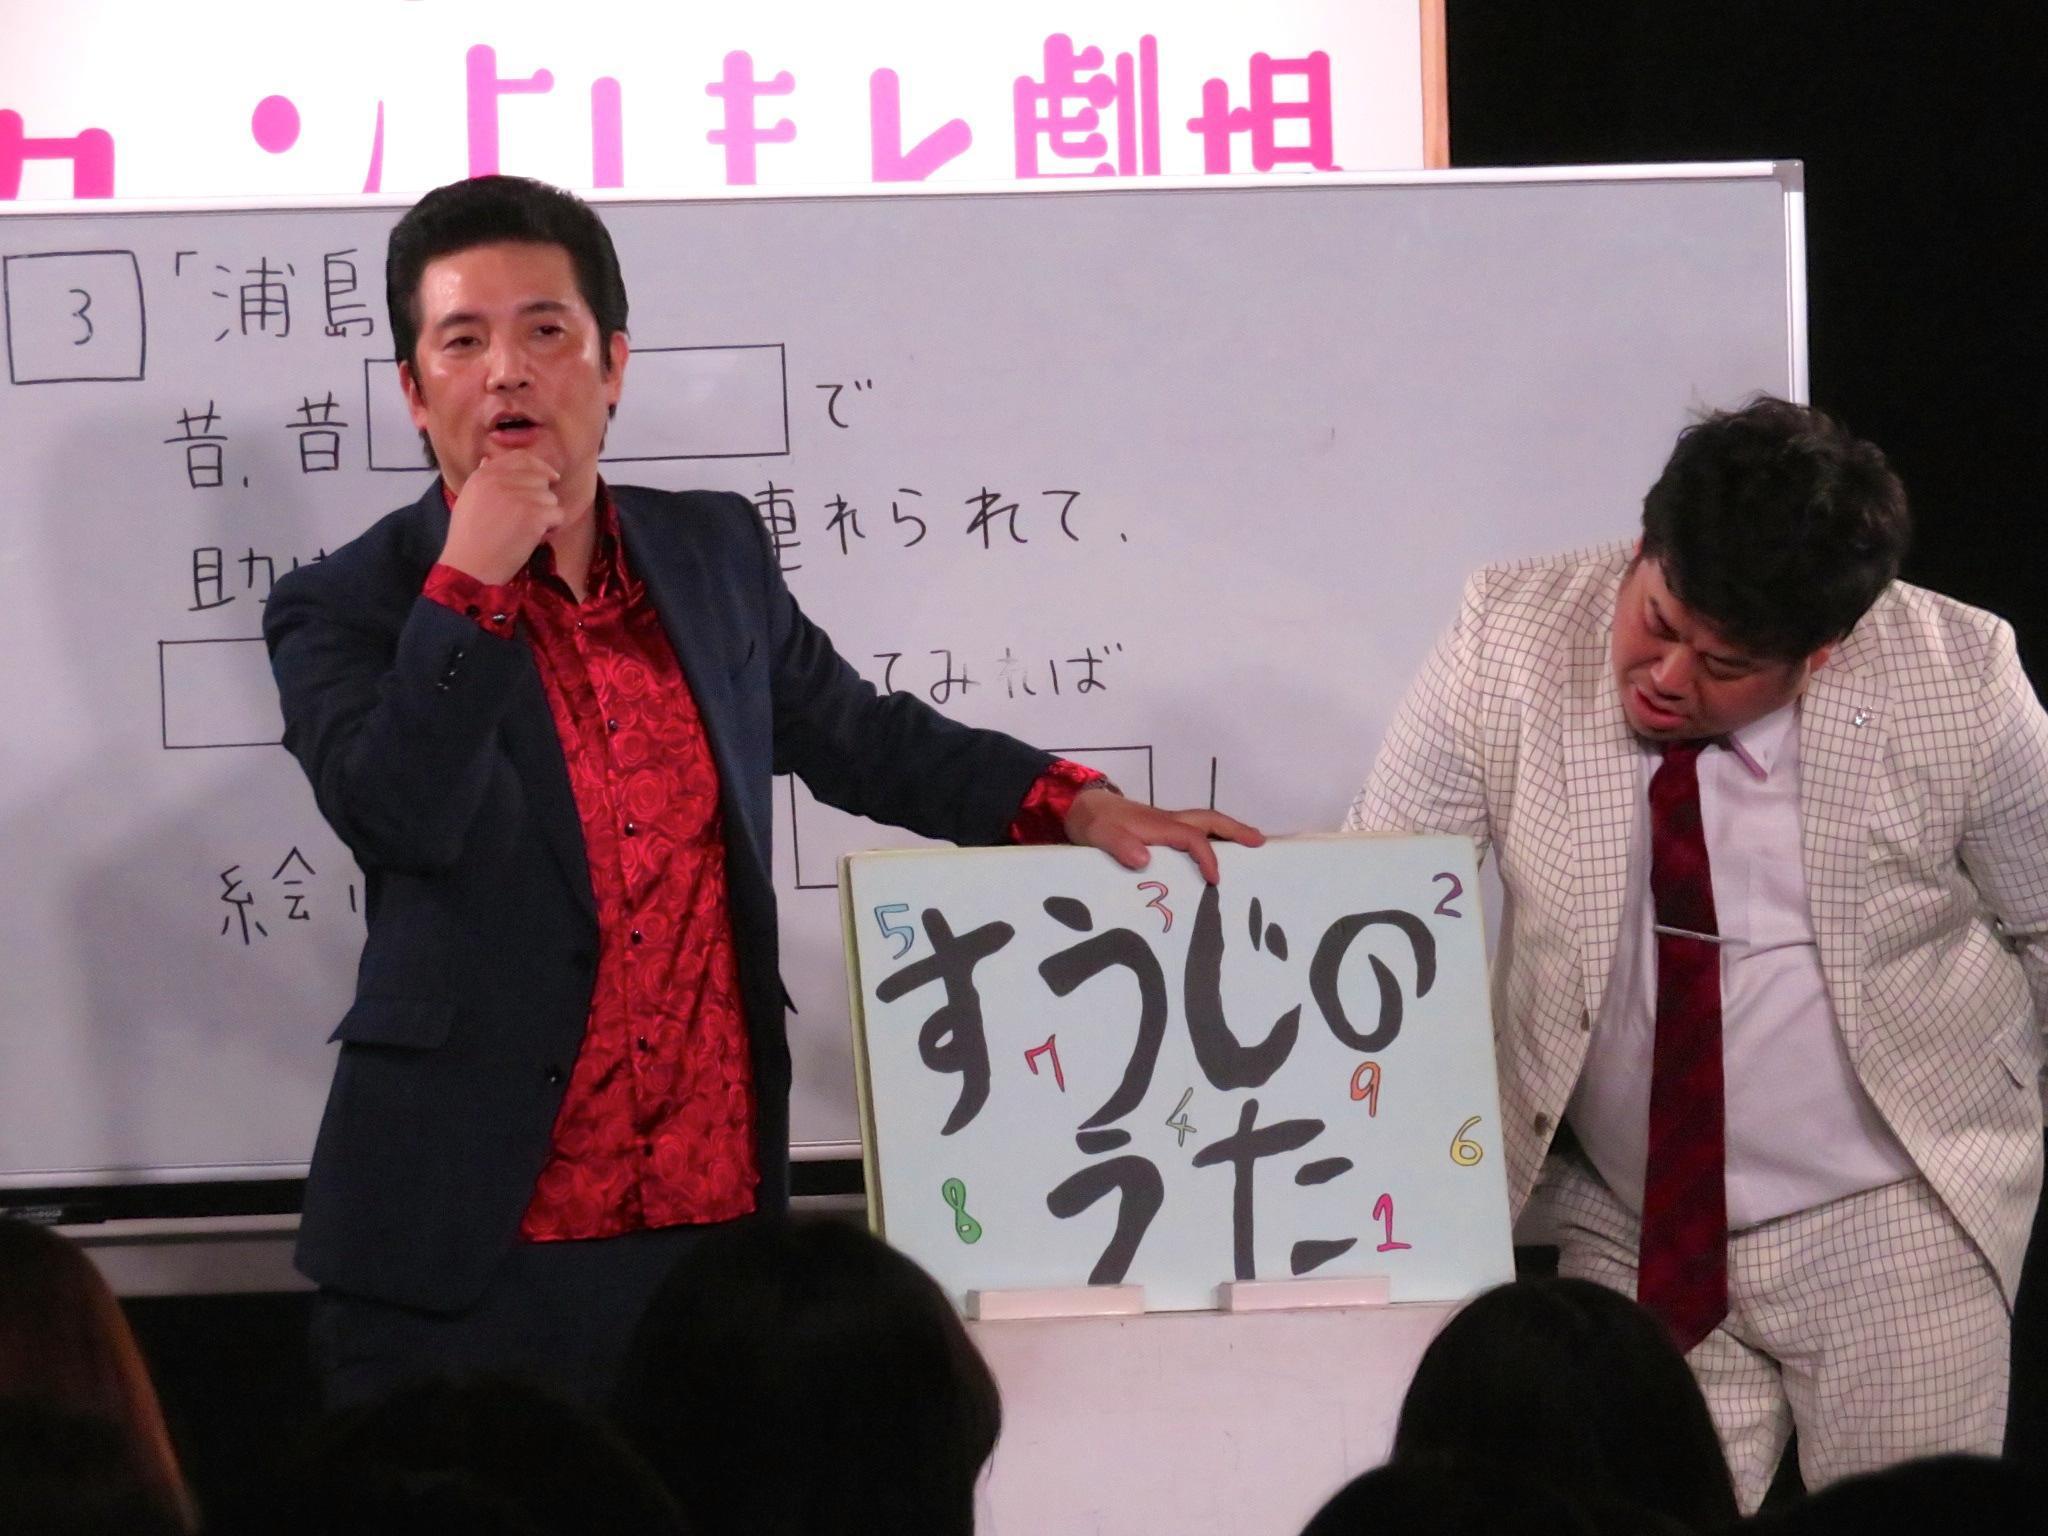 http://news.yoshimoto.co.jp/20171230223620-bb66e73cbc69fa580527ef06abd4ab3a0779f99a.jpg